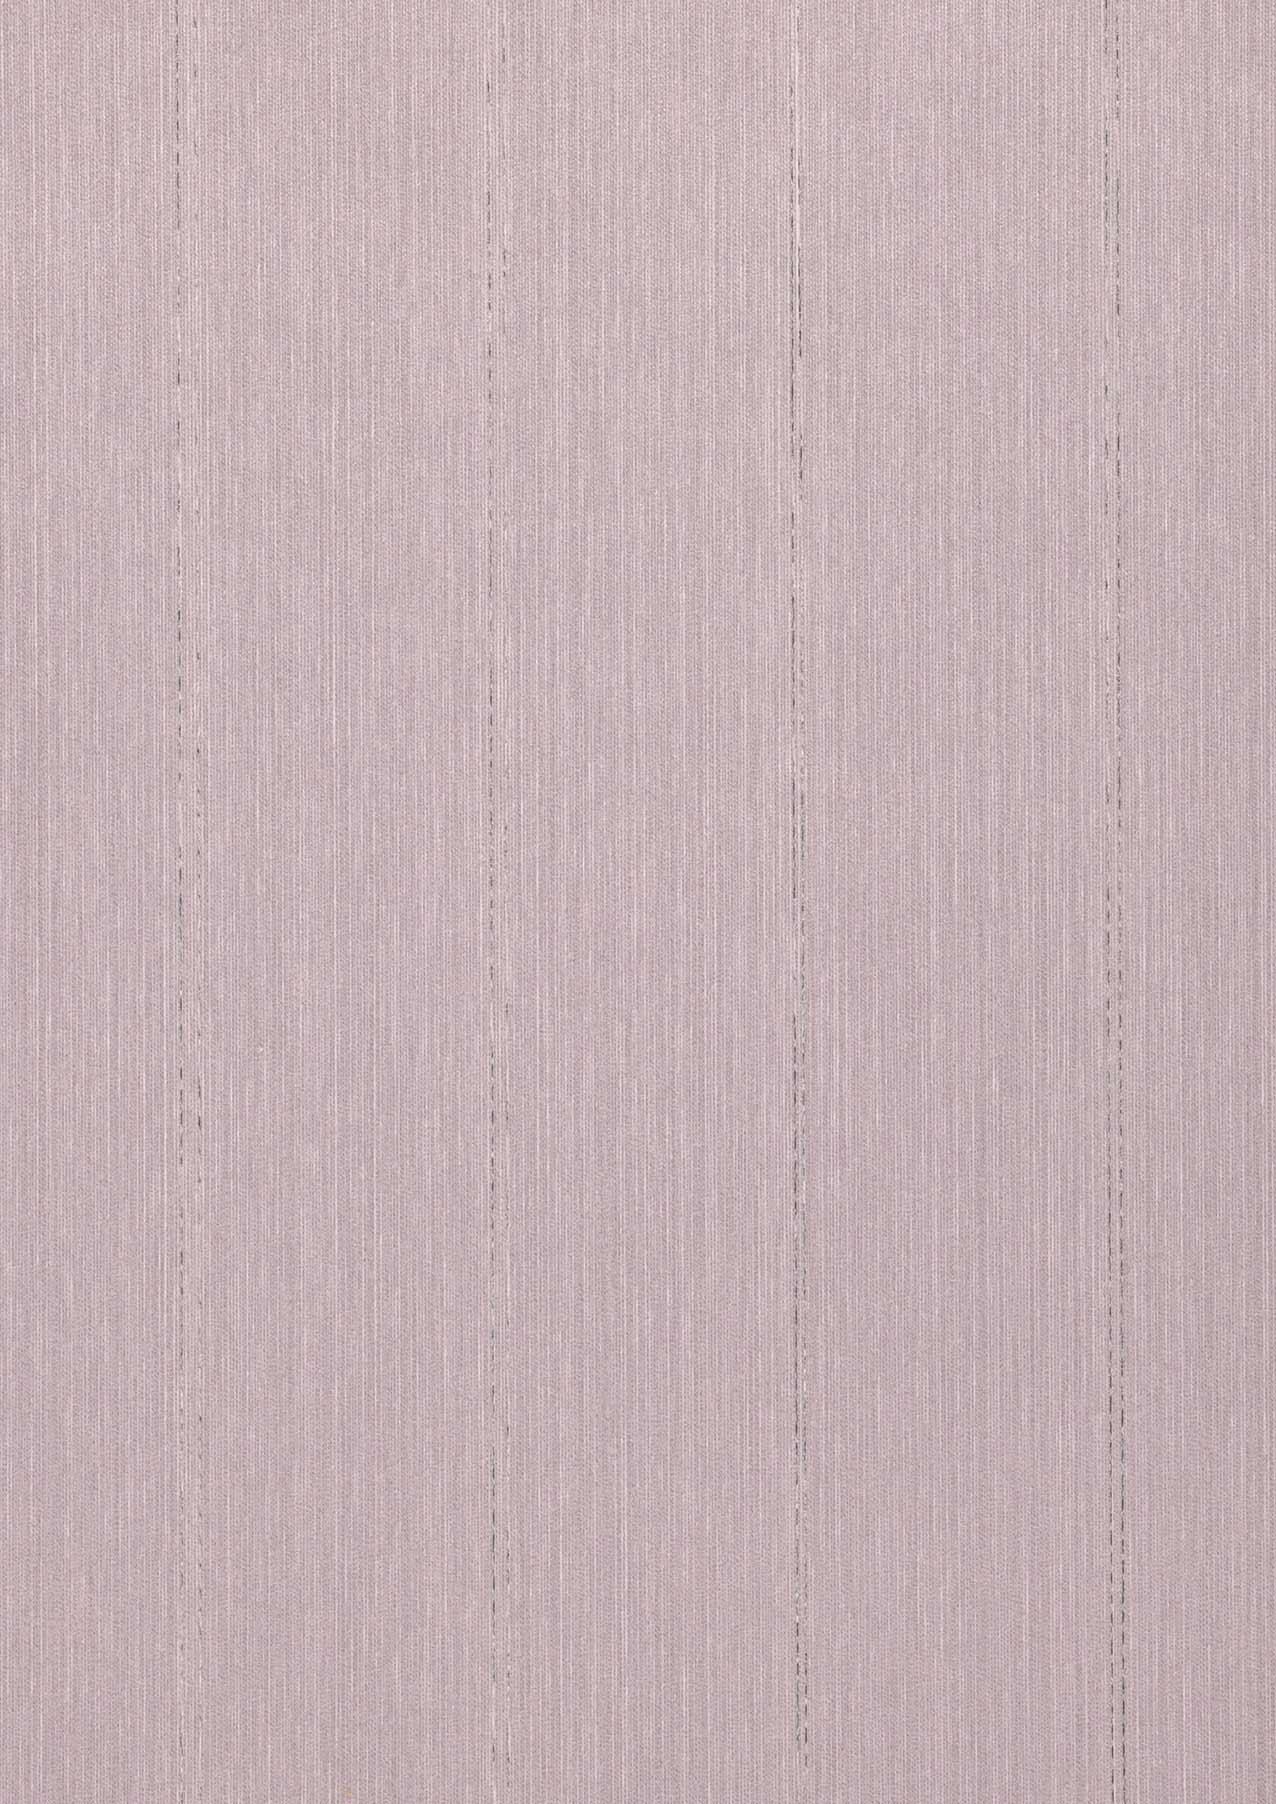 Tapete viviane pastellviolett silber glitzer tapeten for Tapete nach hause